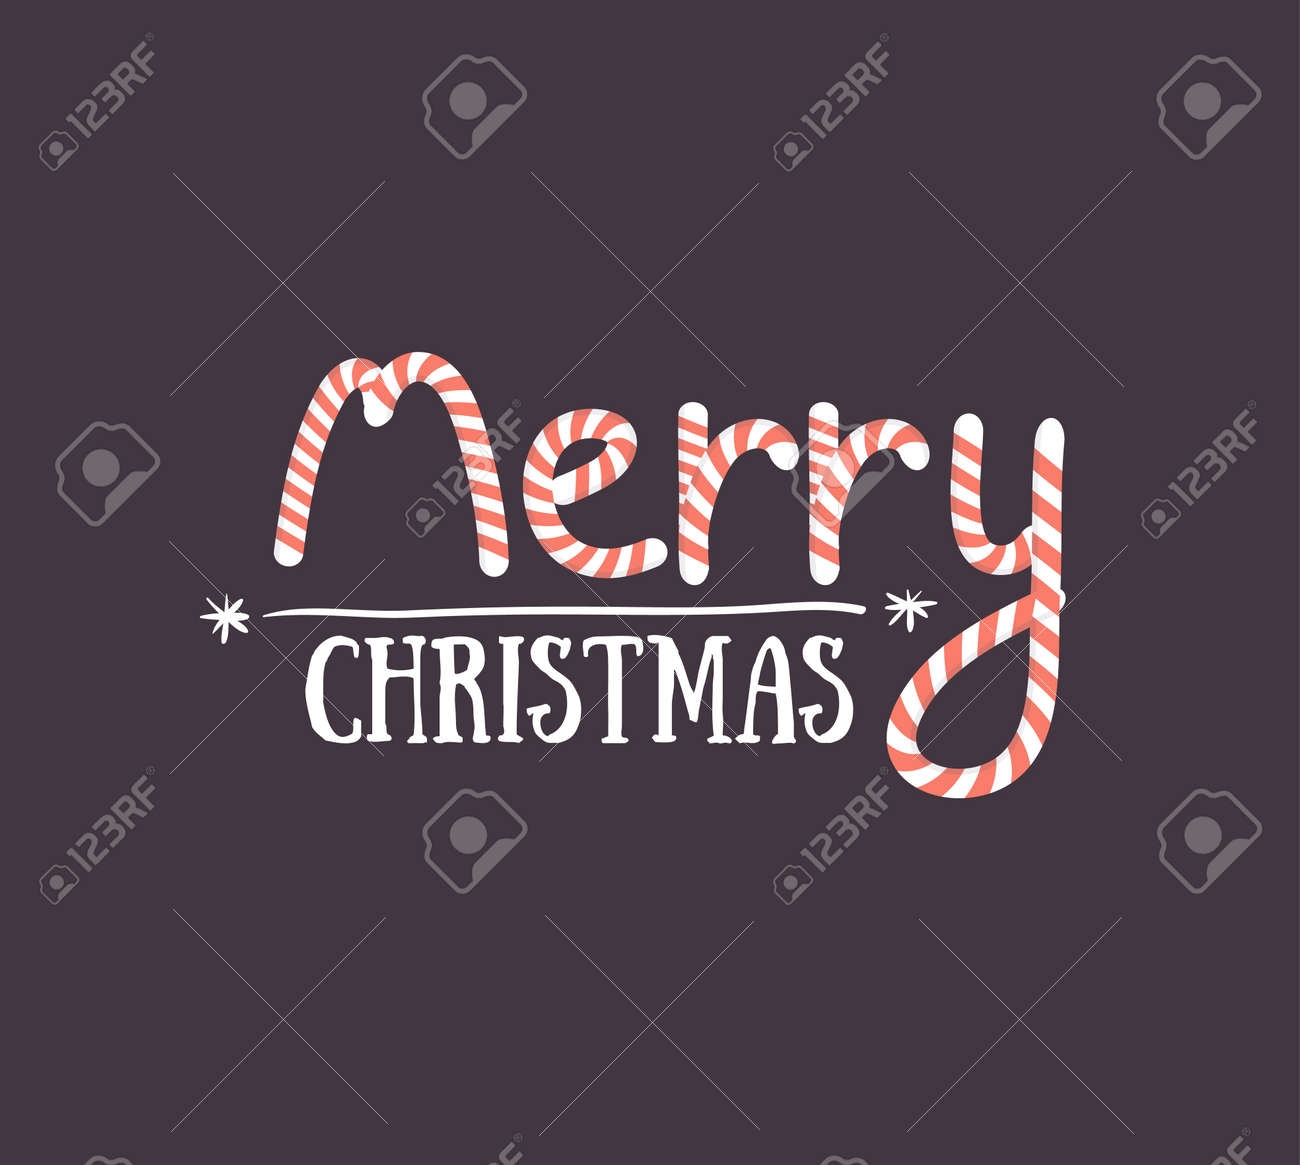 Merry Christmas Greeting Card On Dark Background Season Greeting